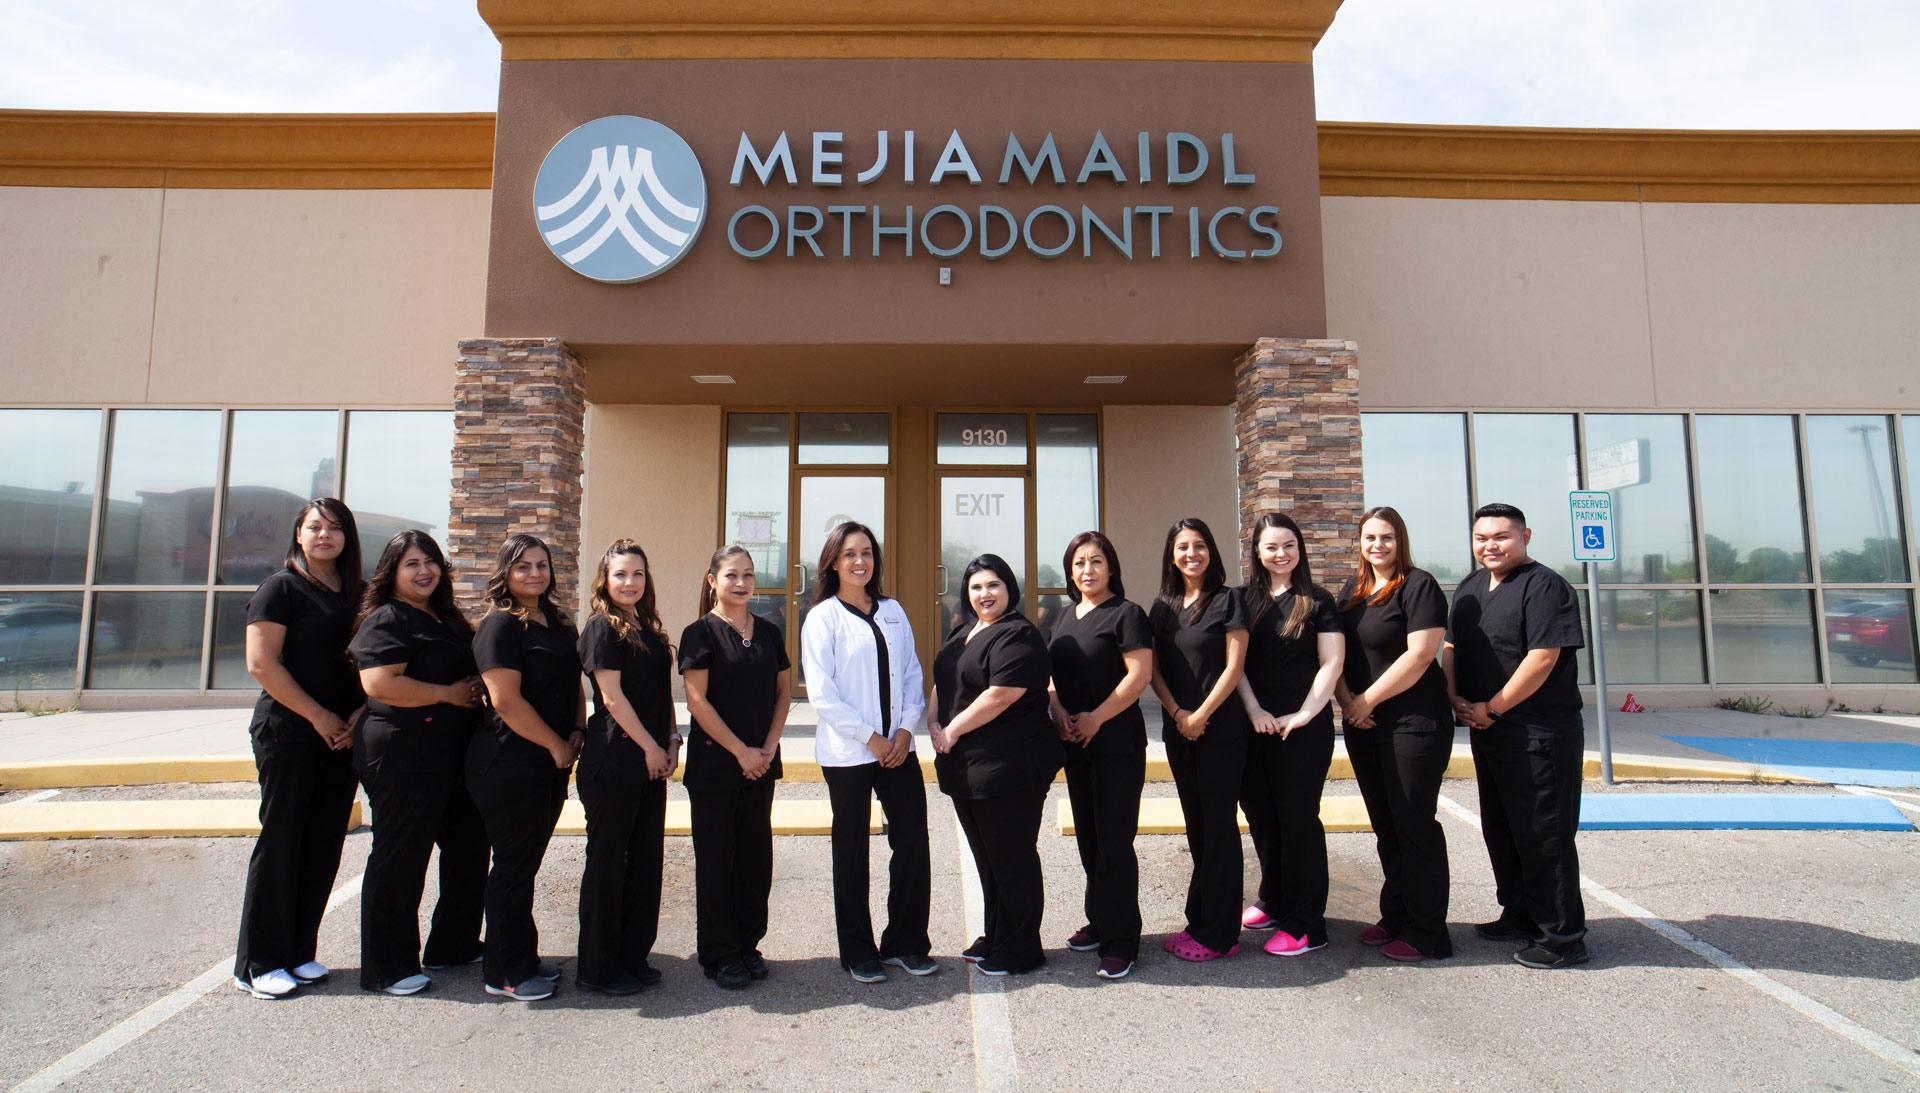 Orthodontist in El Paso, TX